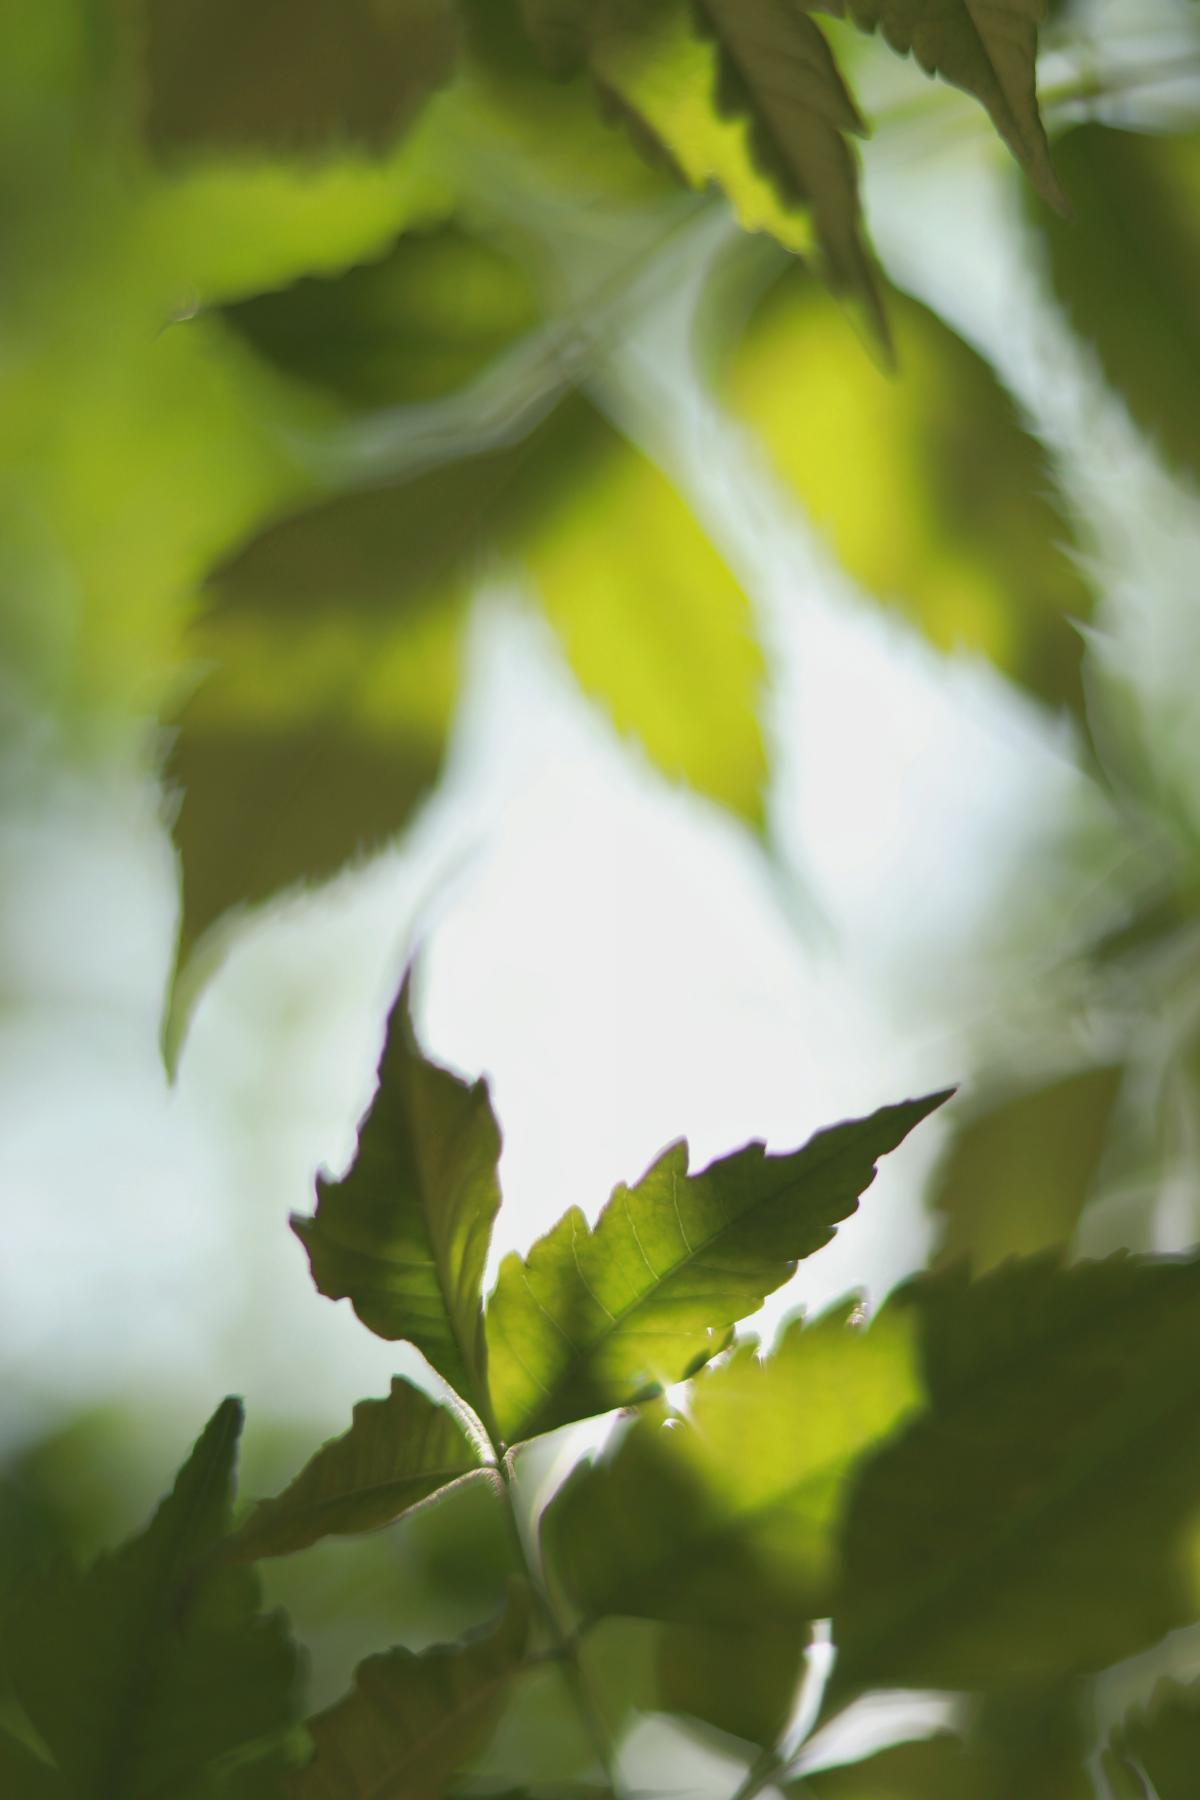 Plant Maple Leaves #421759